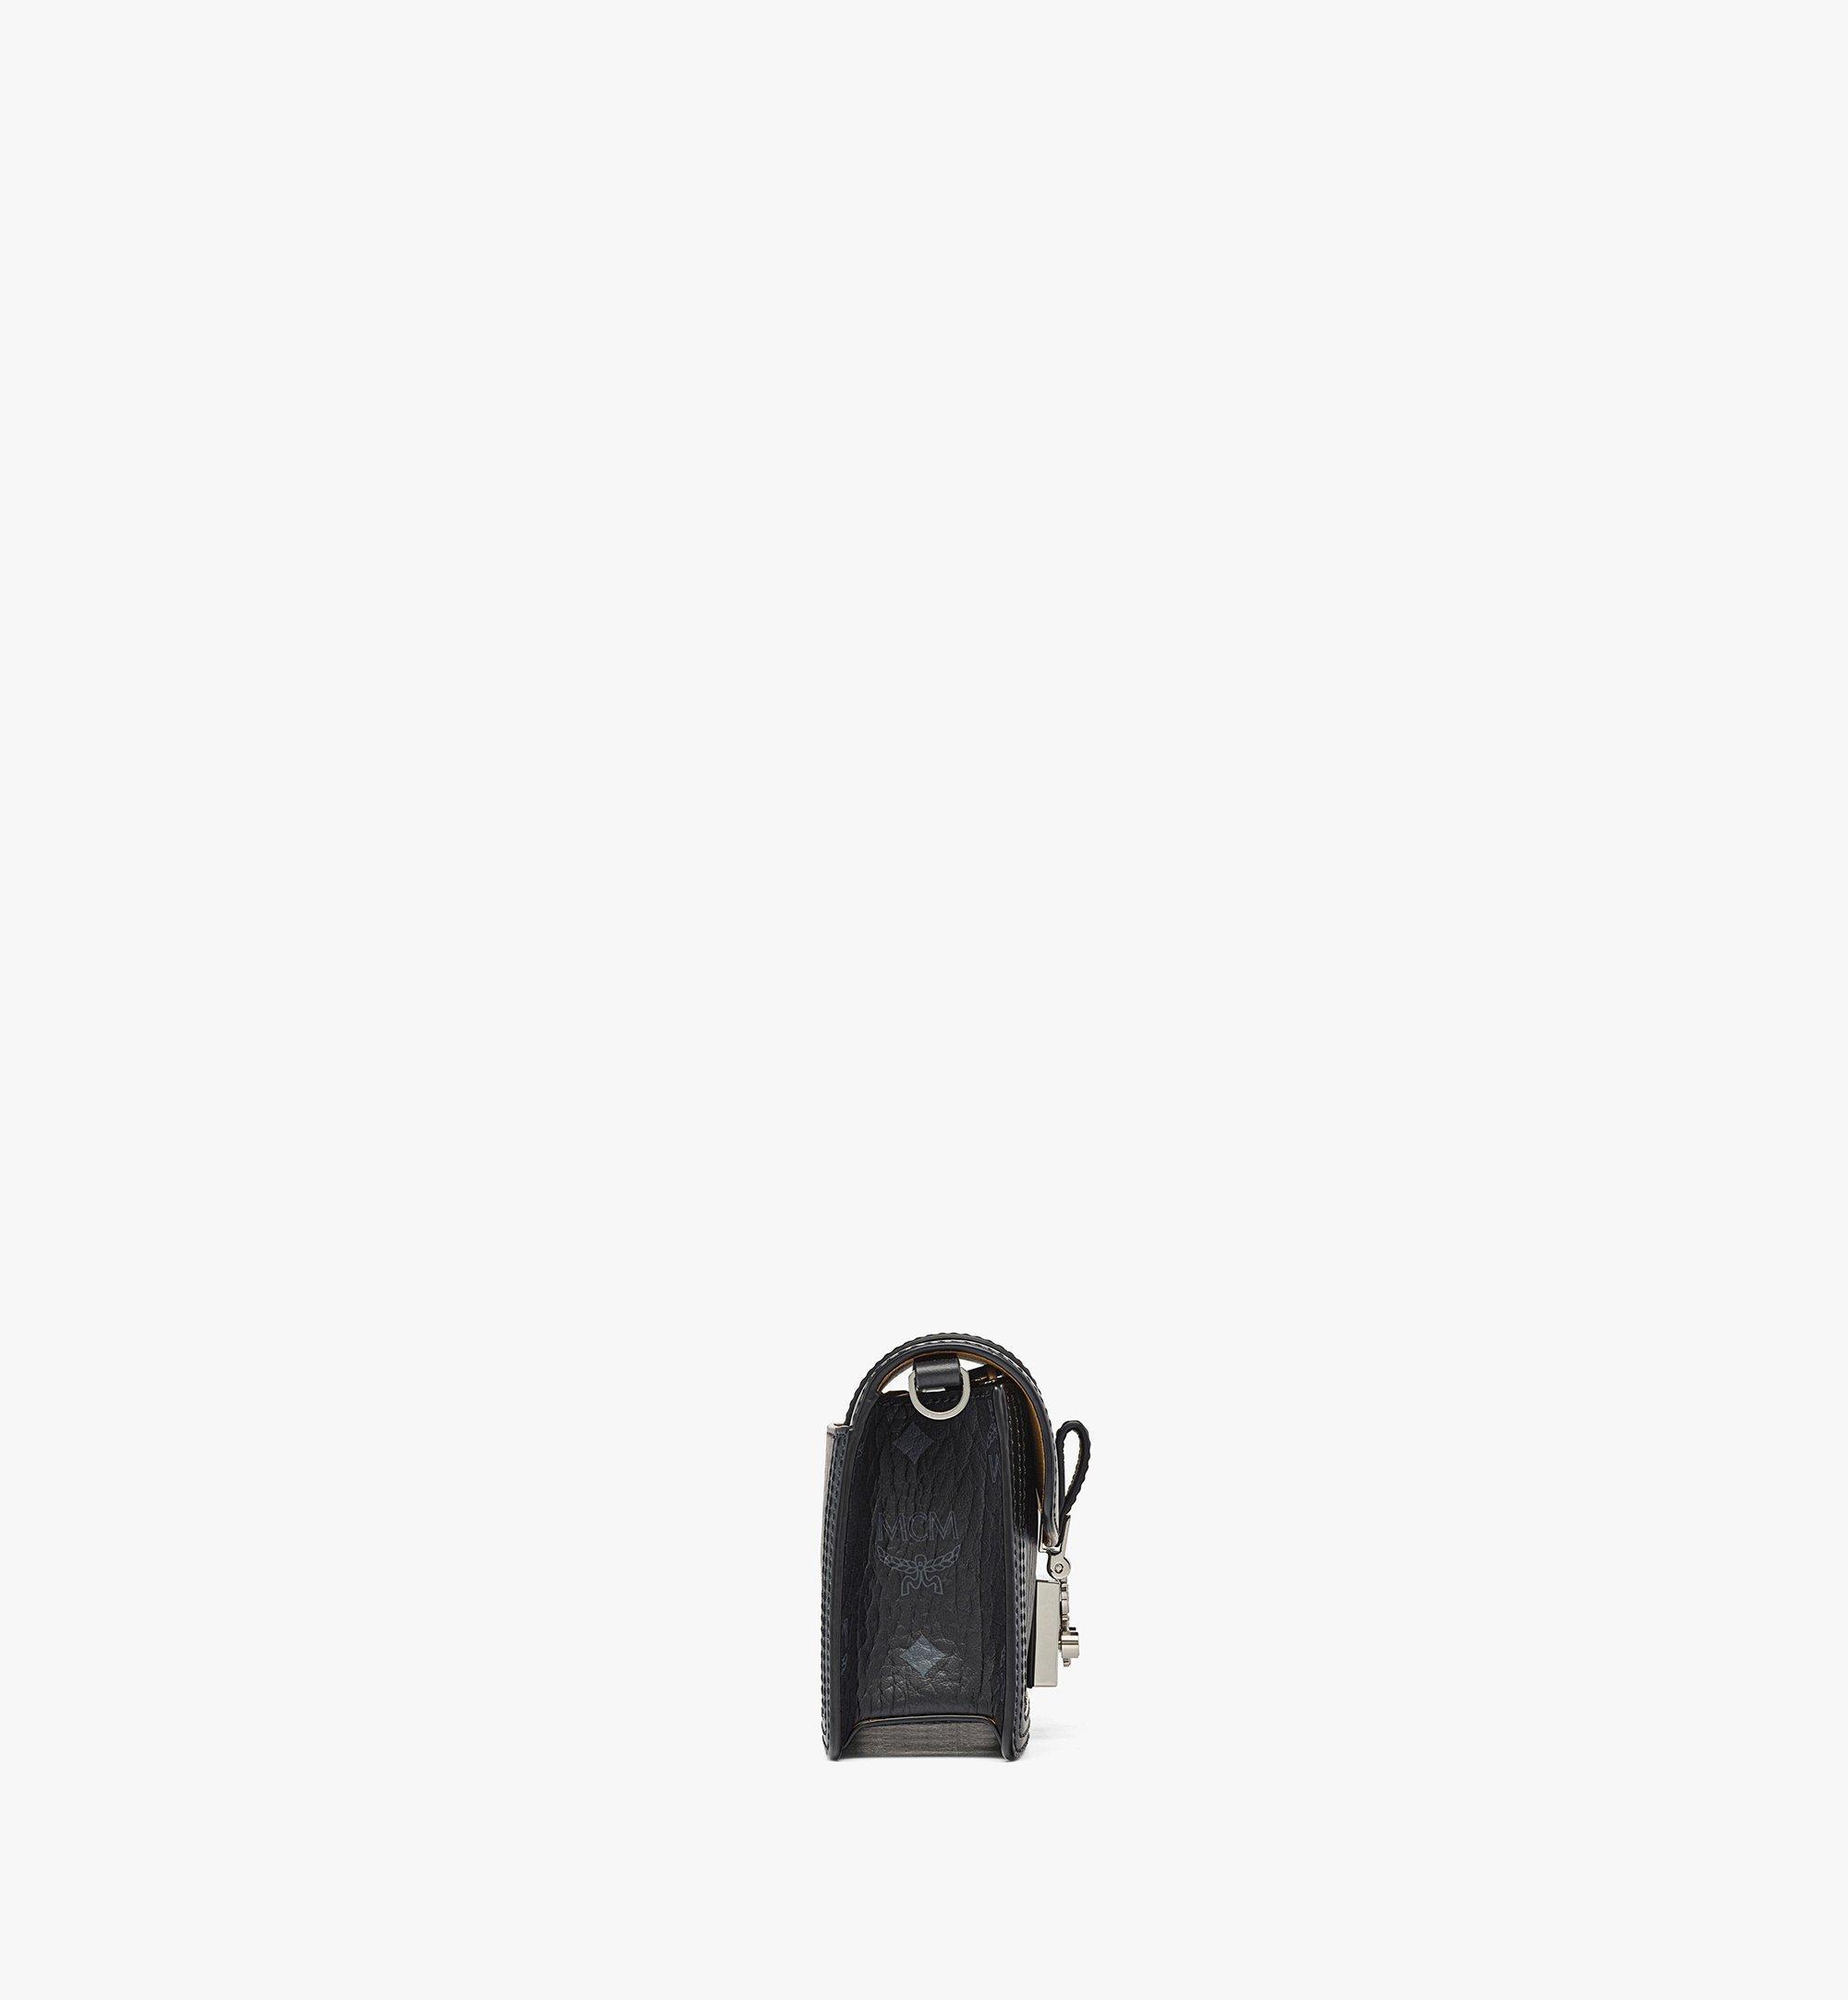 MCM Gretl Crossbody in Visetos Leather Block Black MWRBAWO02BK001 Alternate View 1